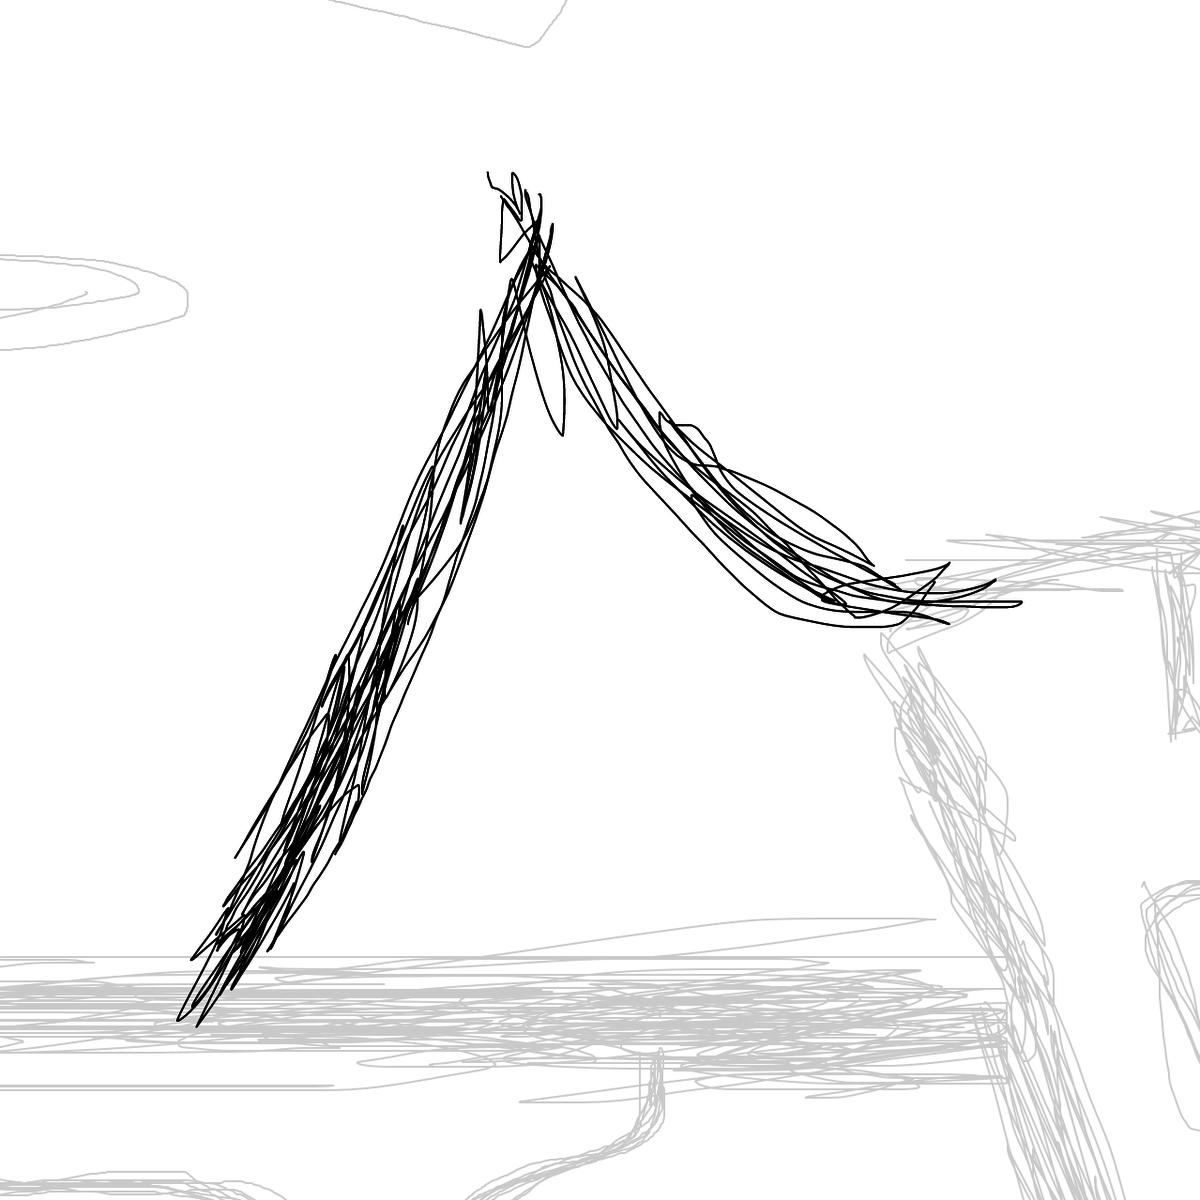 BAAAM drawing#23482 lat:52.4760131835937500lng: 13.4061393737792970